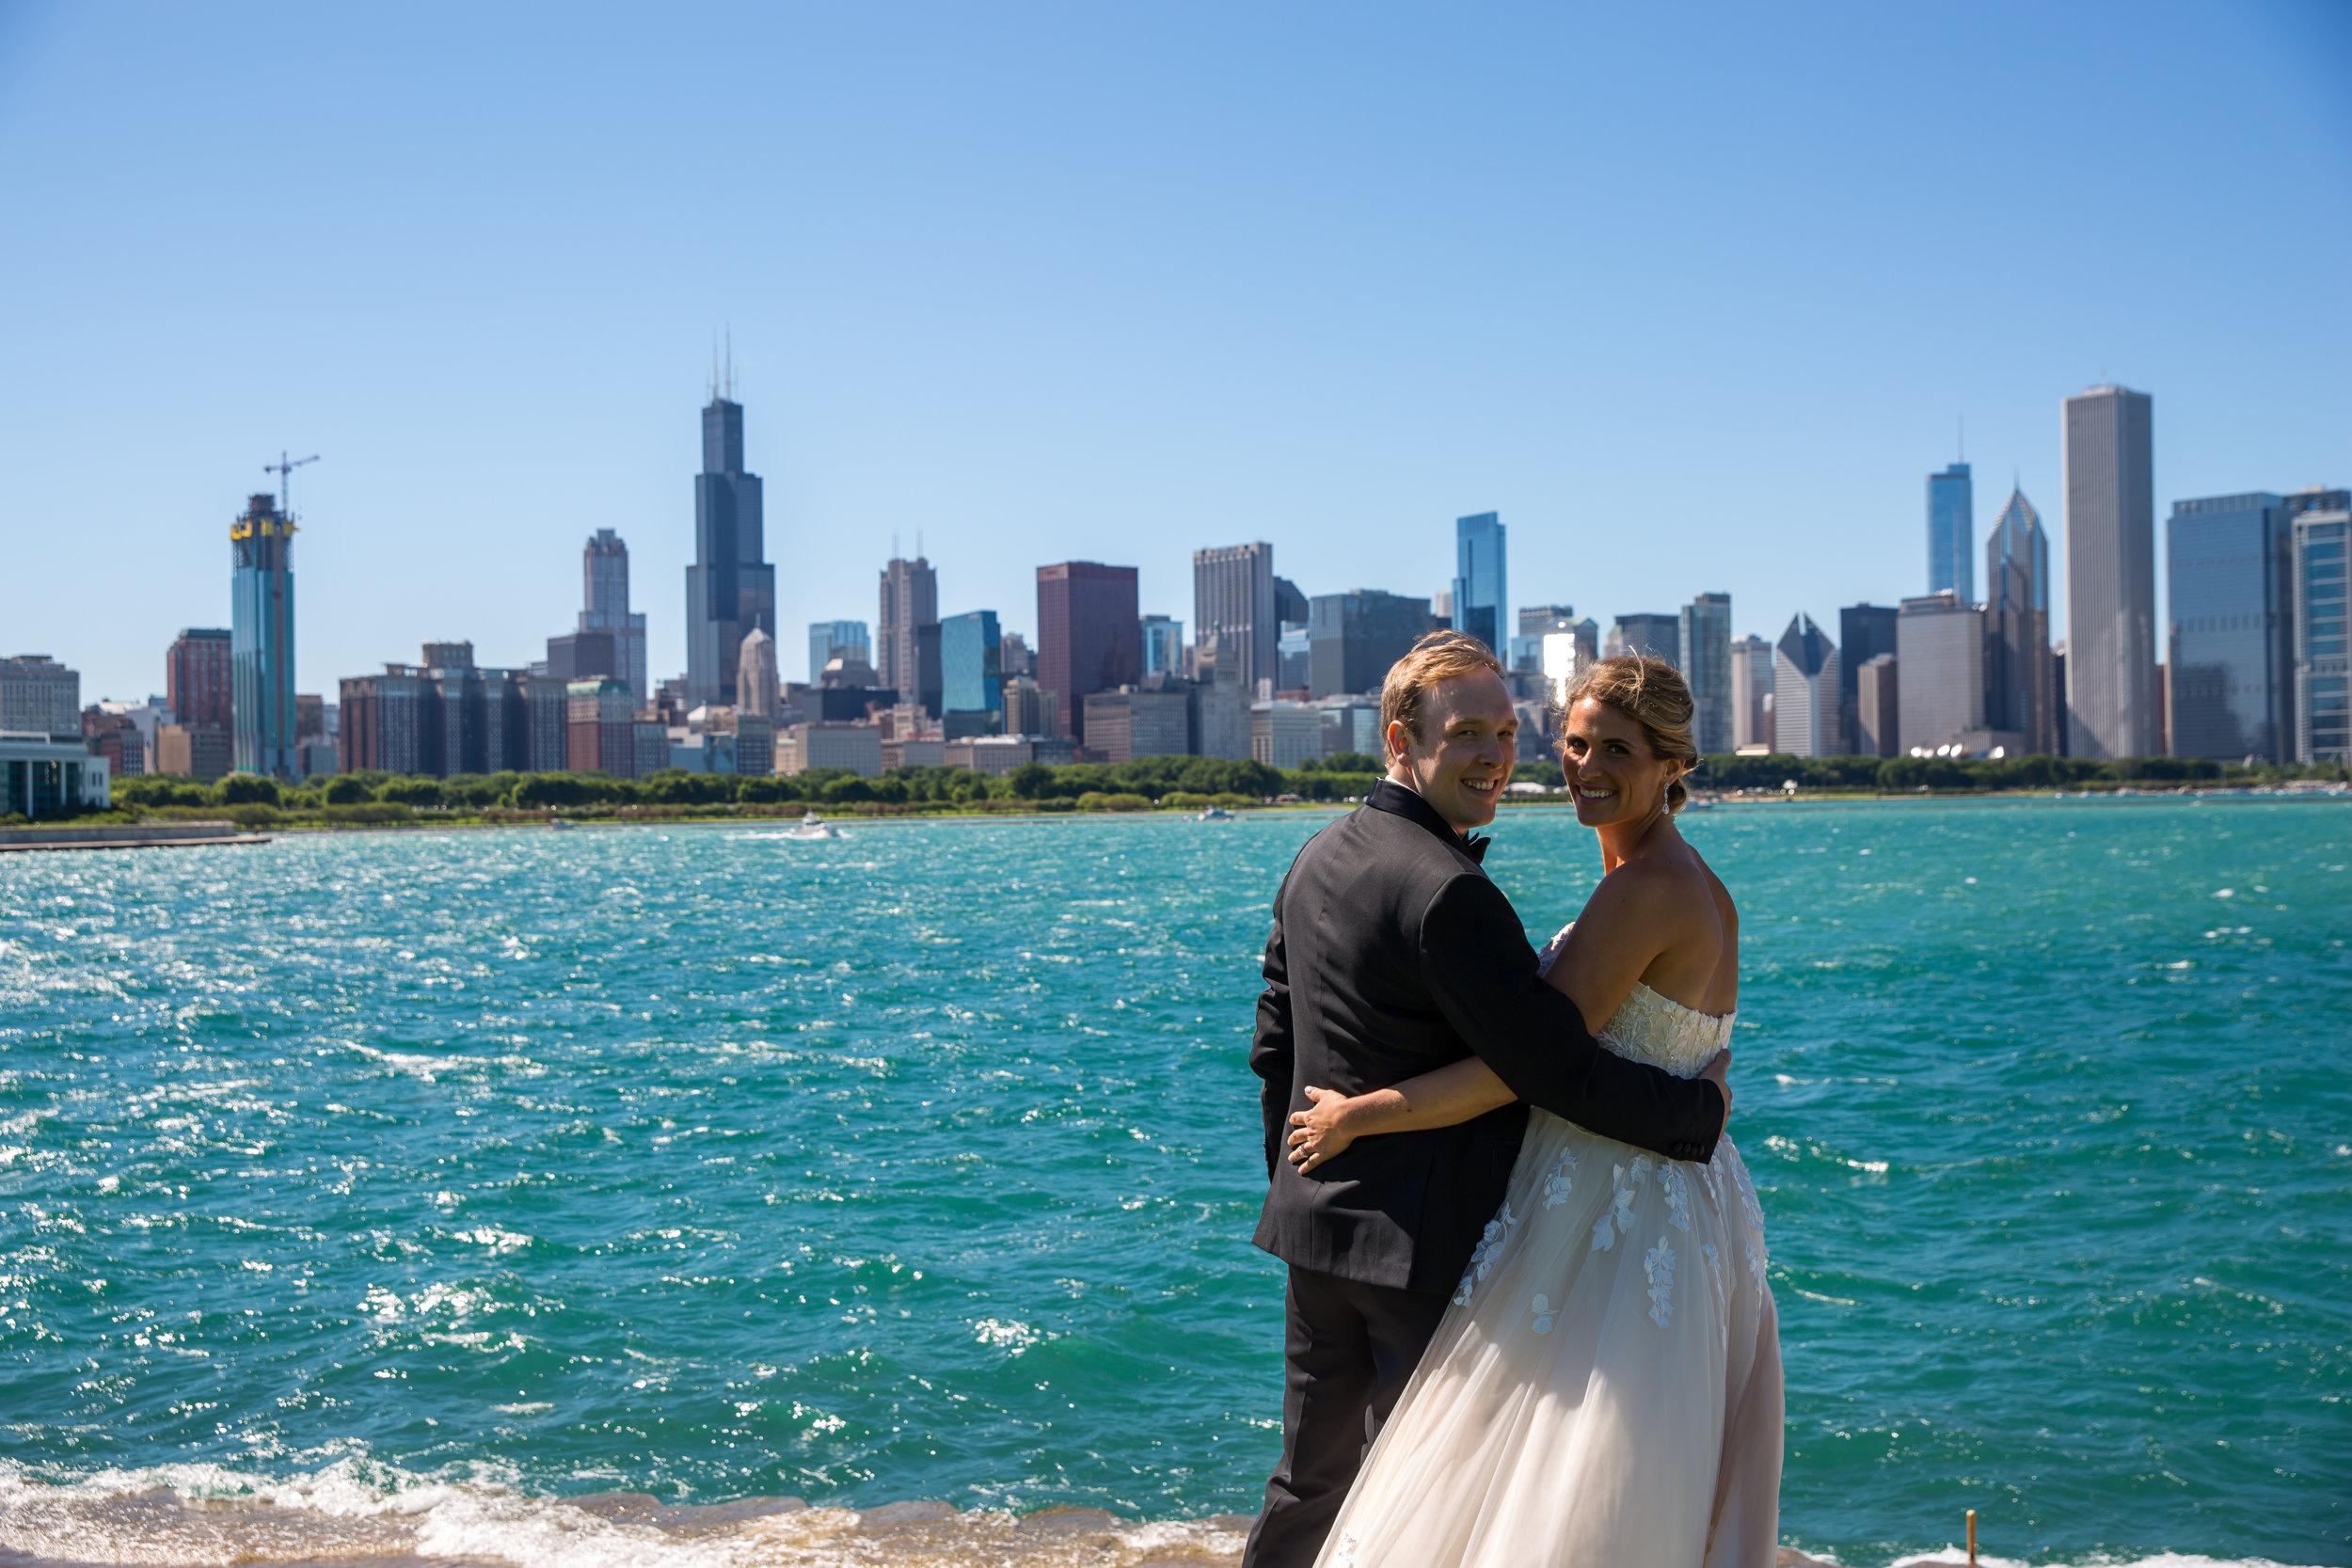 Carrie & George - Chicago, ILVenue: Bridgeport Art Center - Skyline LoftPhotographer: Crane Photography